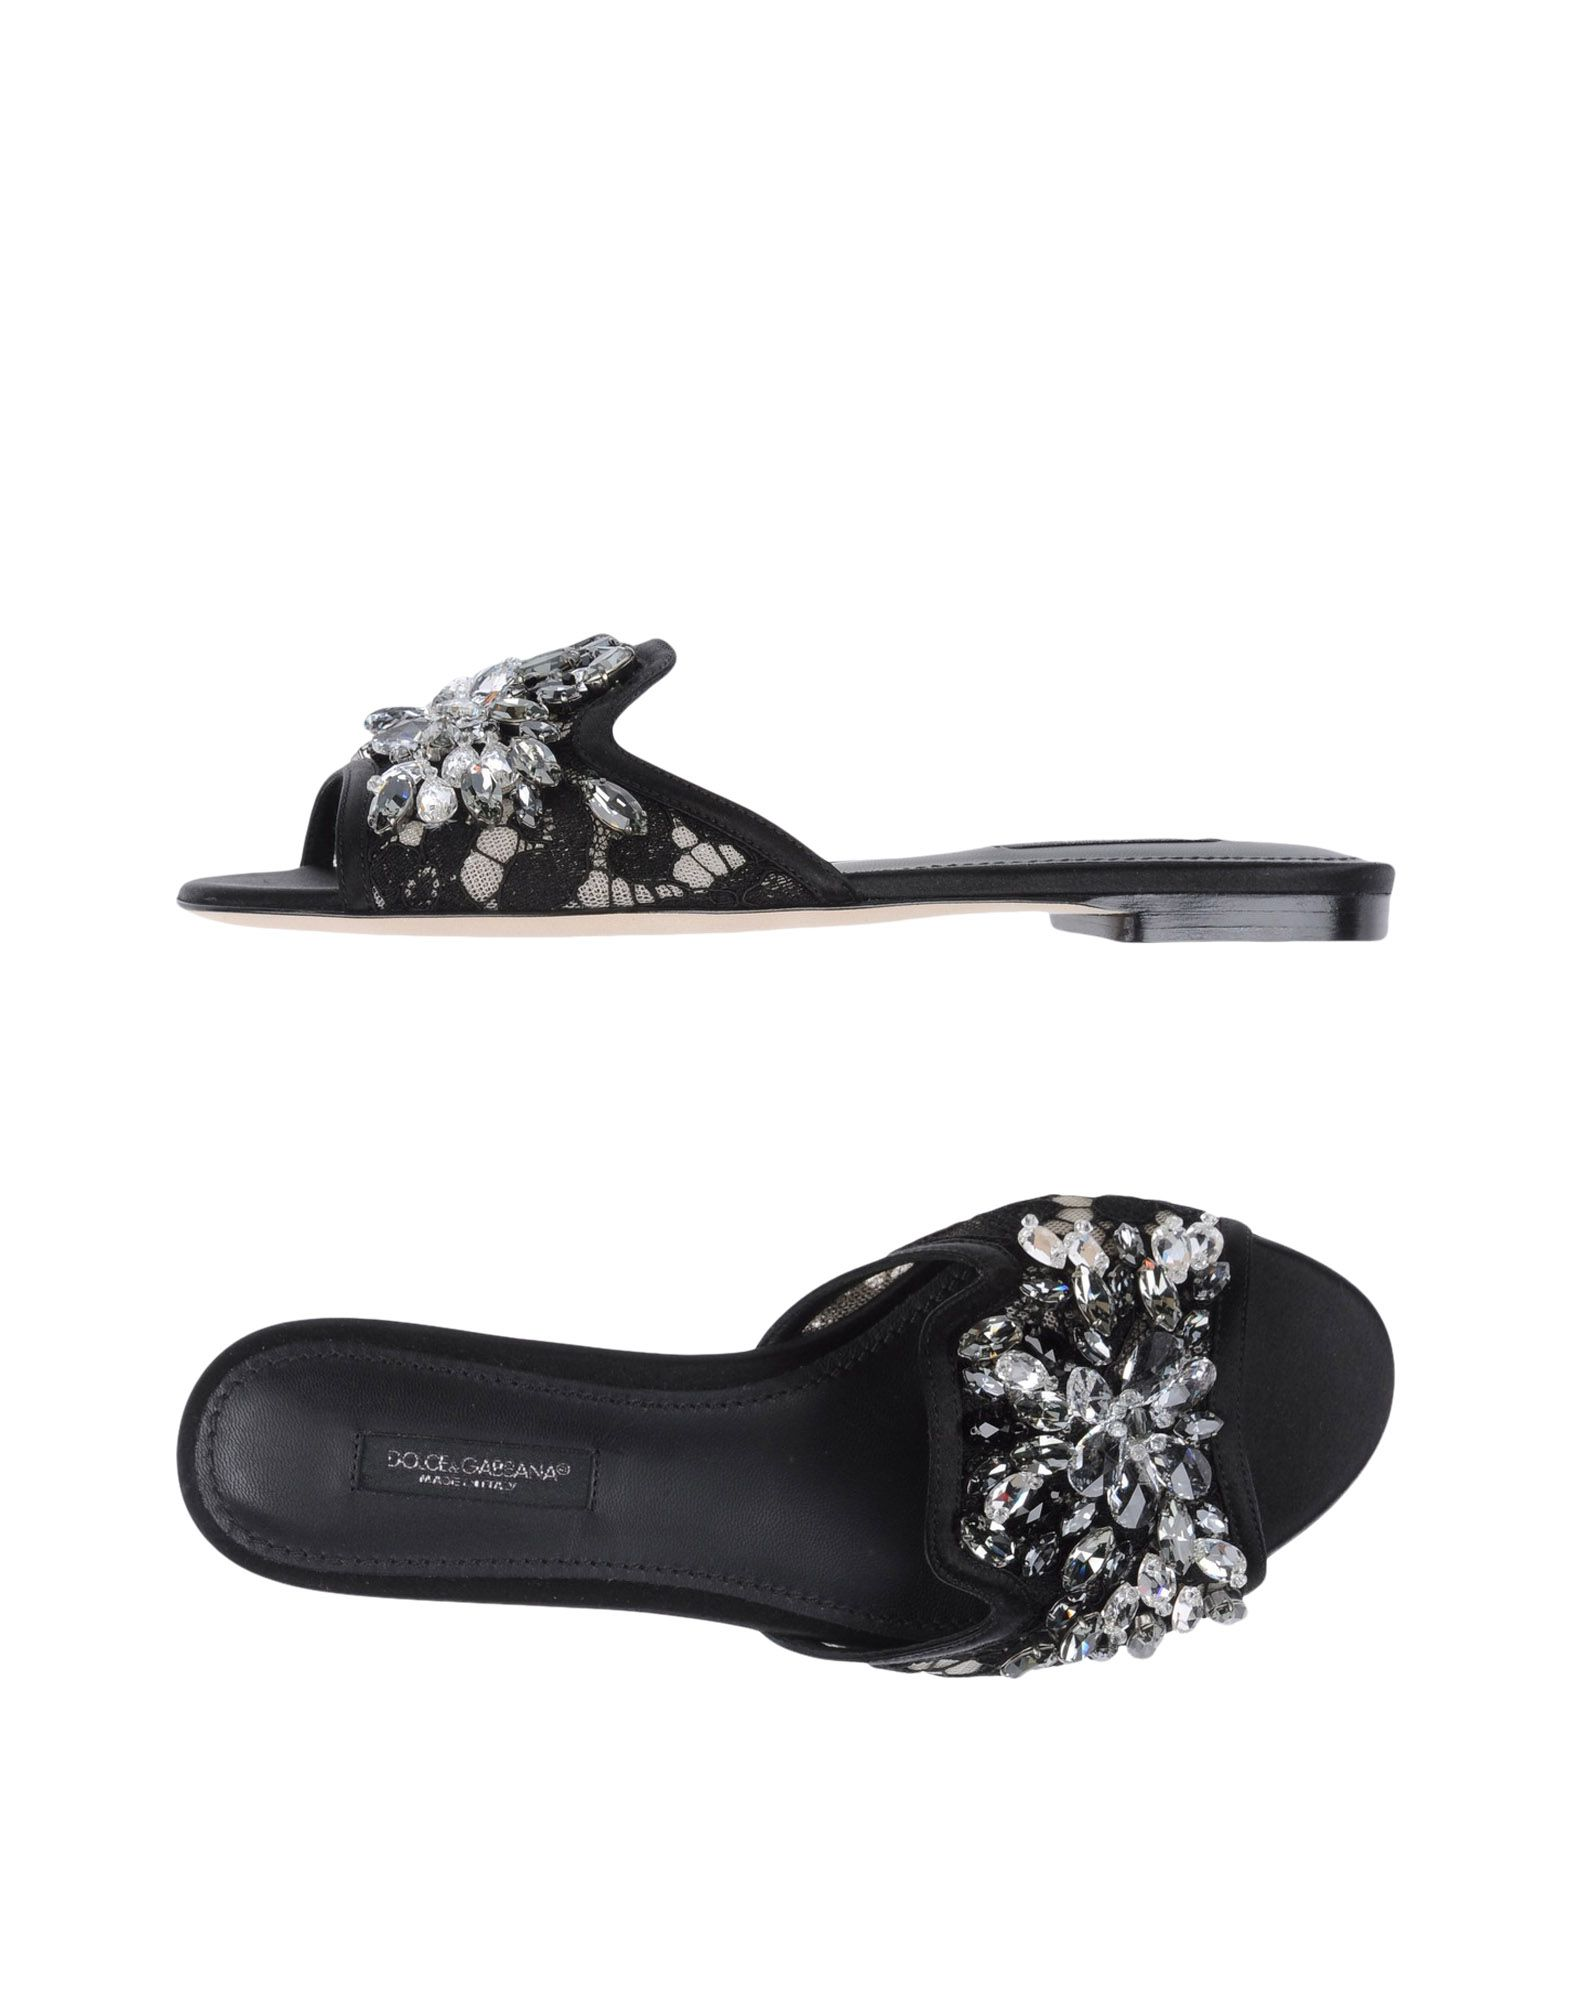 Dolce & Gabbana Sandalen Damen Schuhe  11189659WVGünstige gut aussehende Schuhe Damen 0c1244